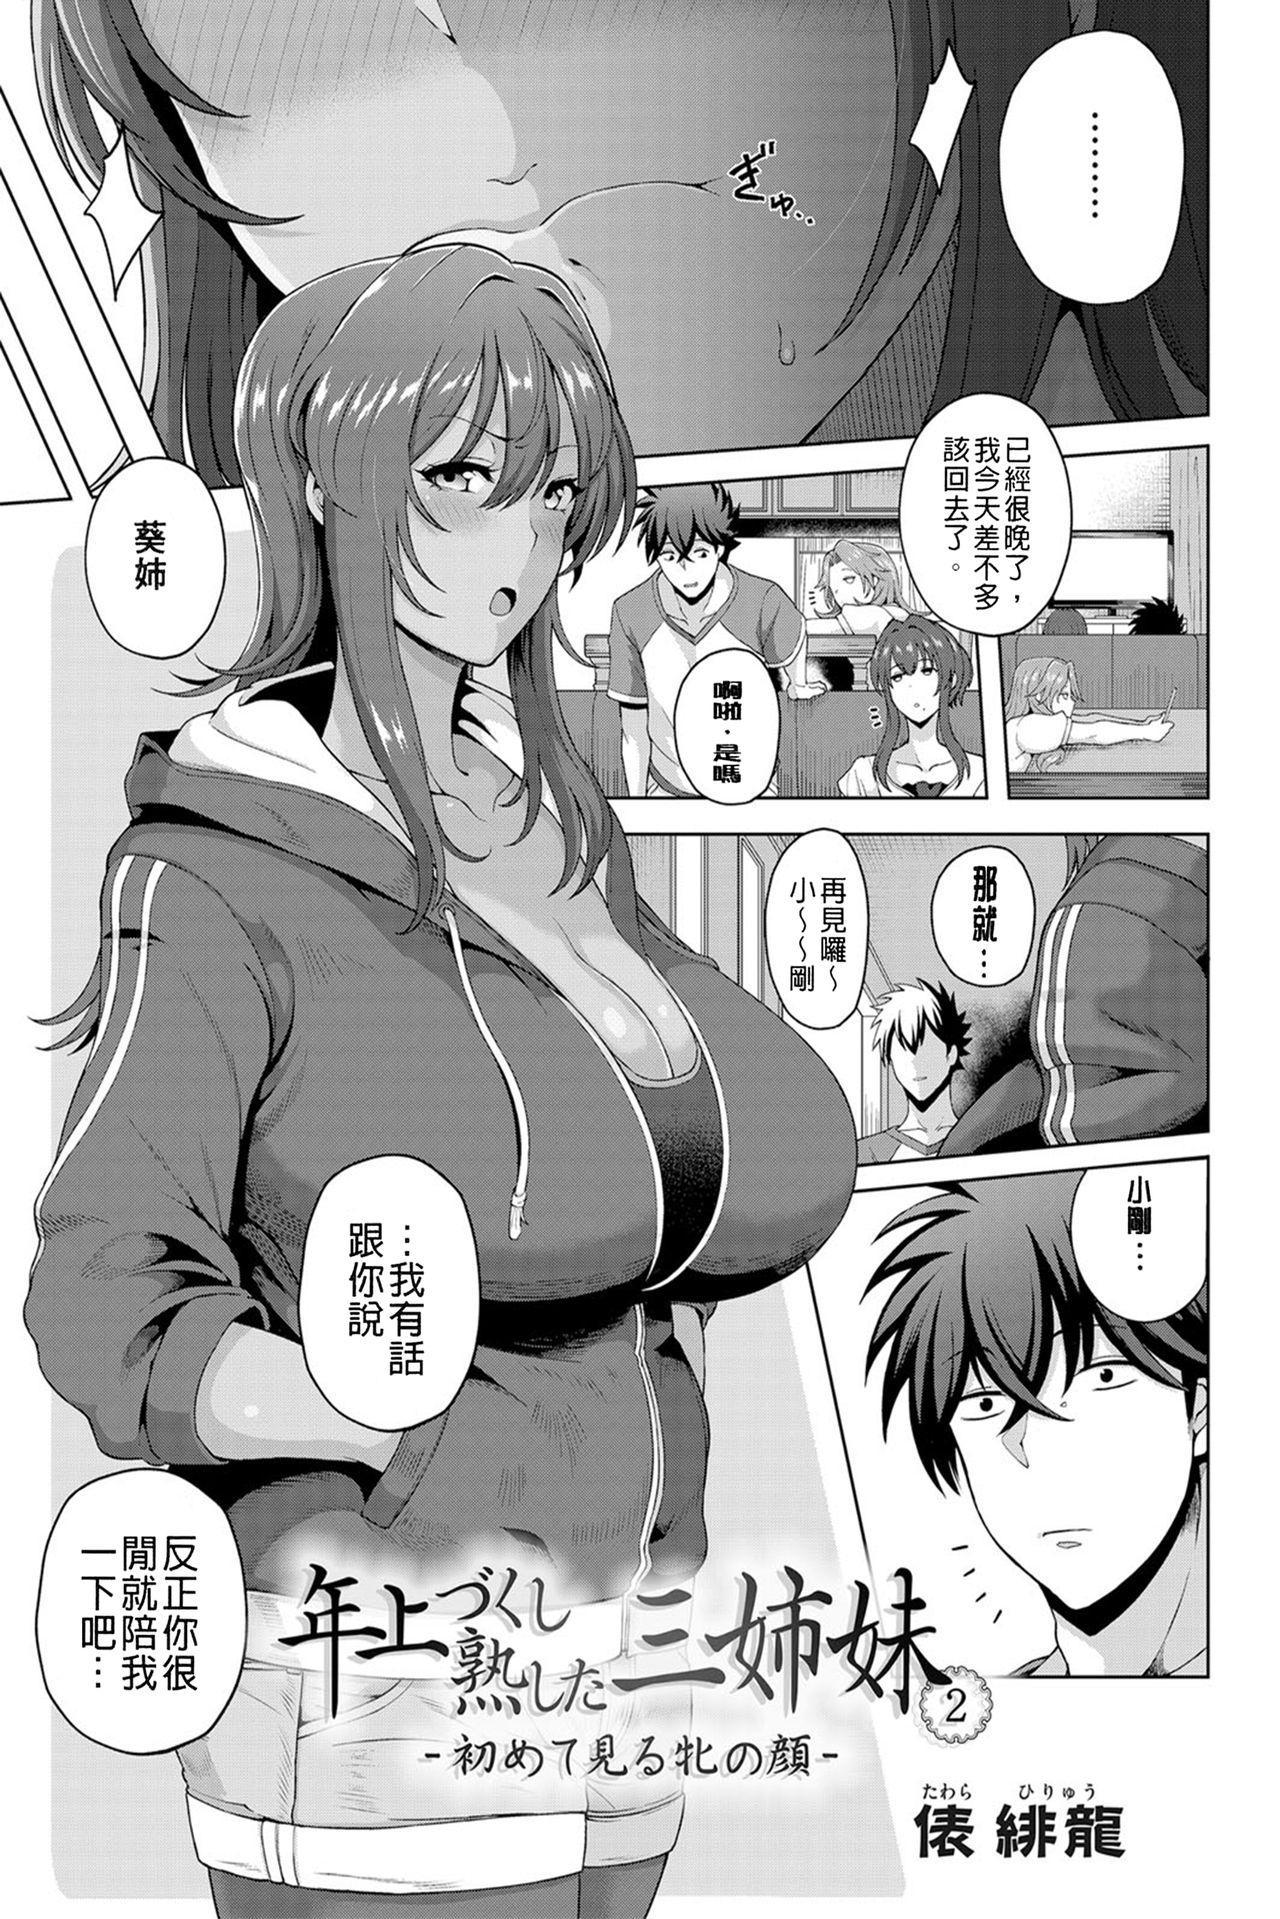 Juku Mesu - Erotic Mature Women 35